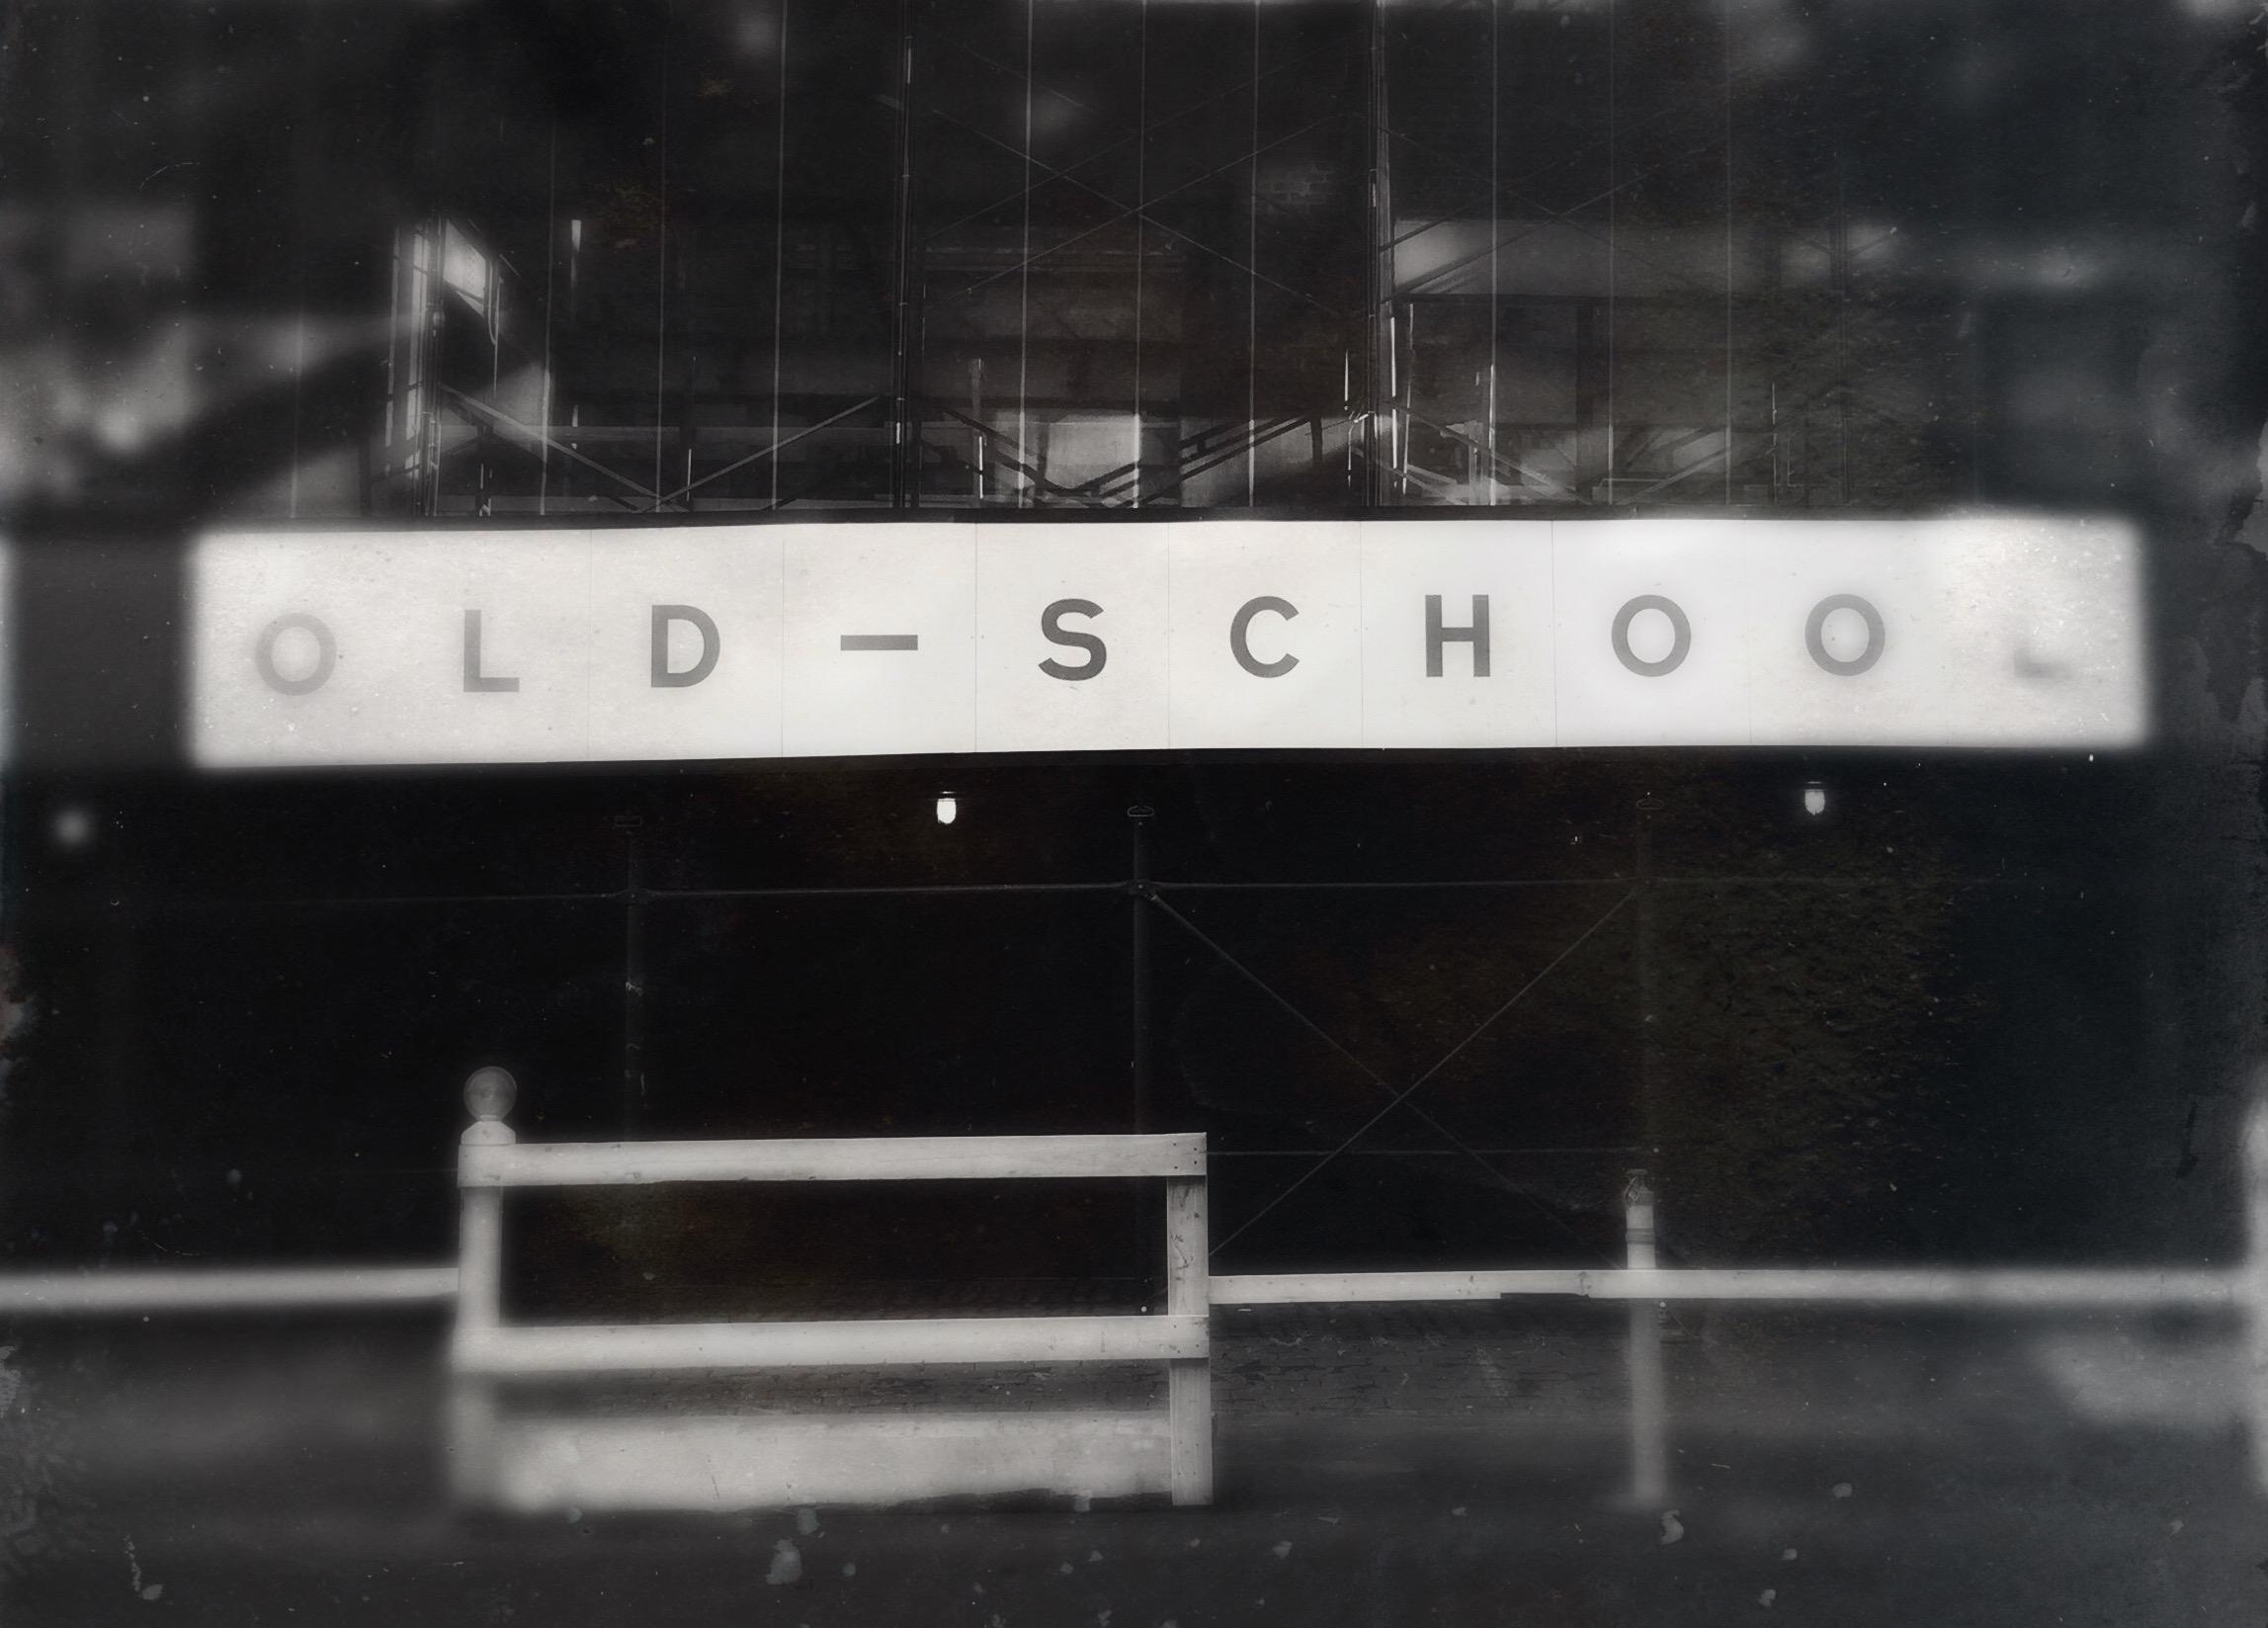 Hipstamatic: Old School